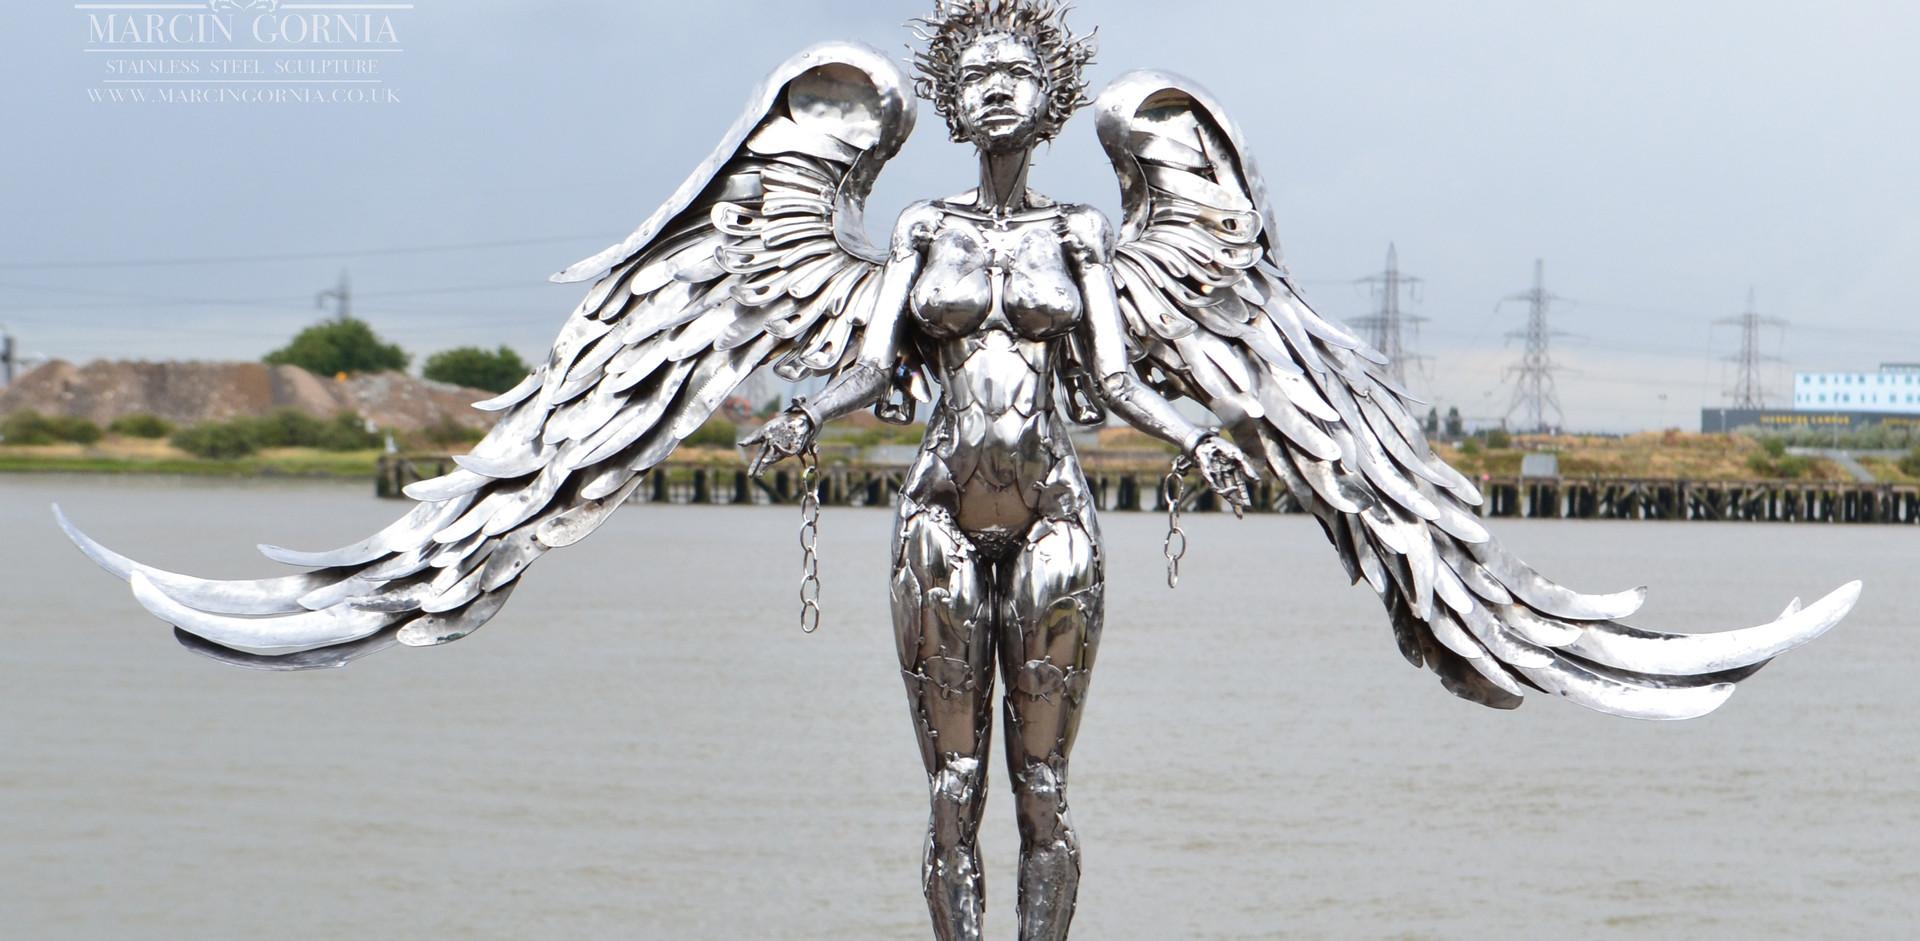 Angel sculpture by Marcin Gornia 1